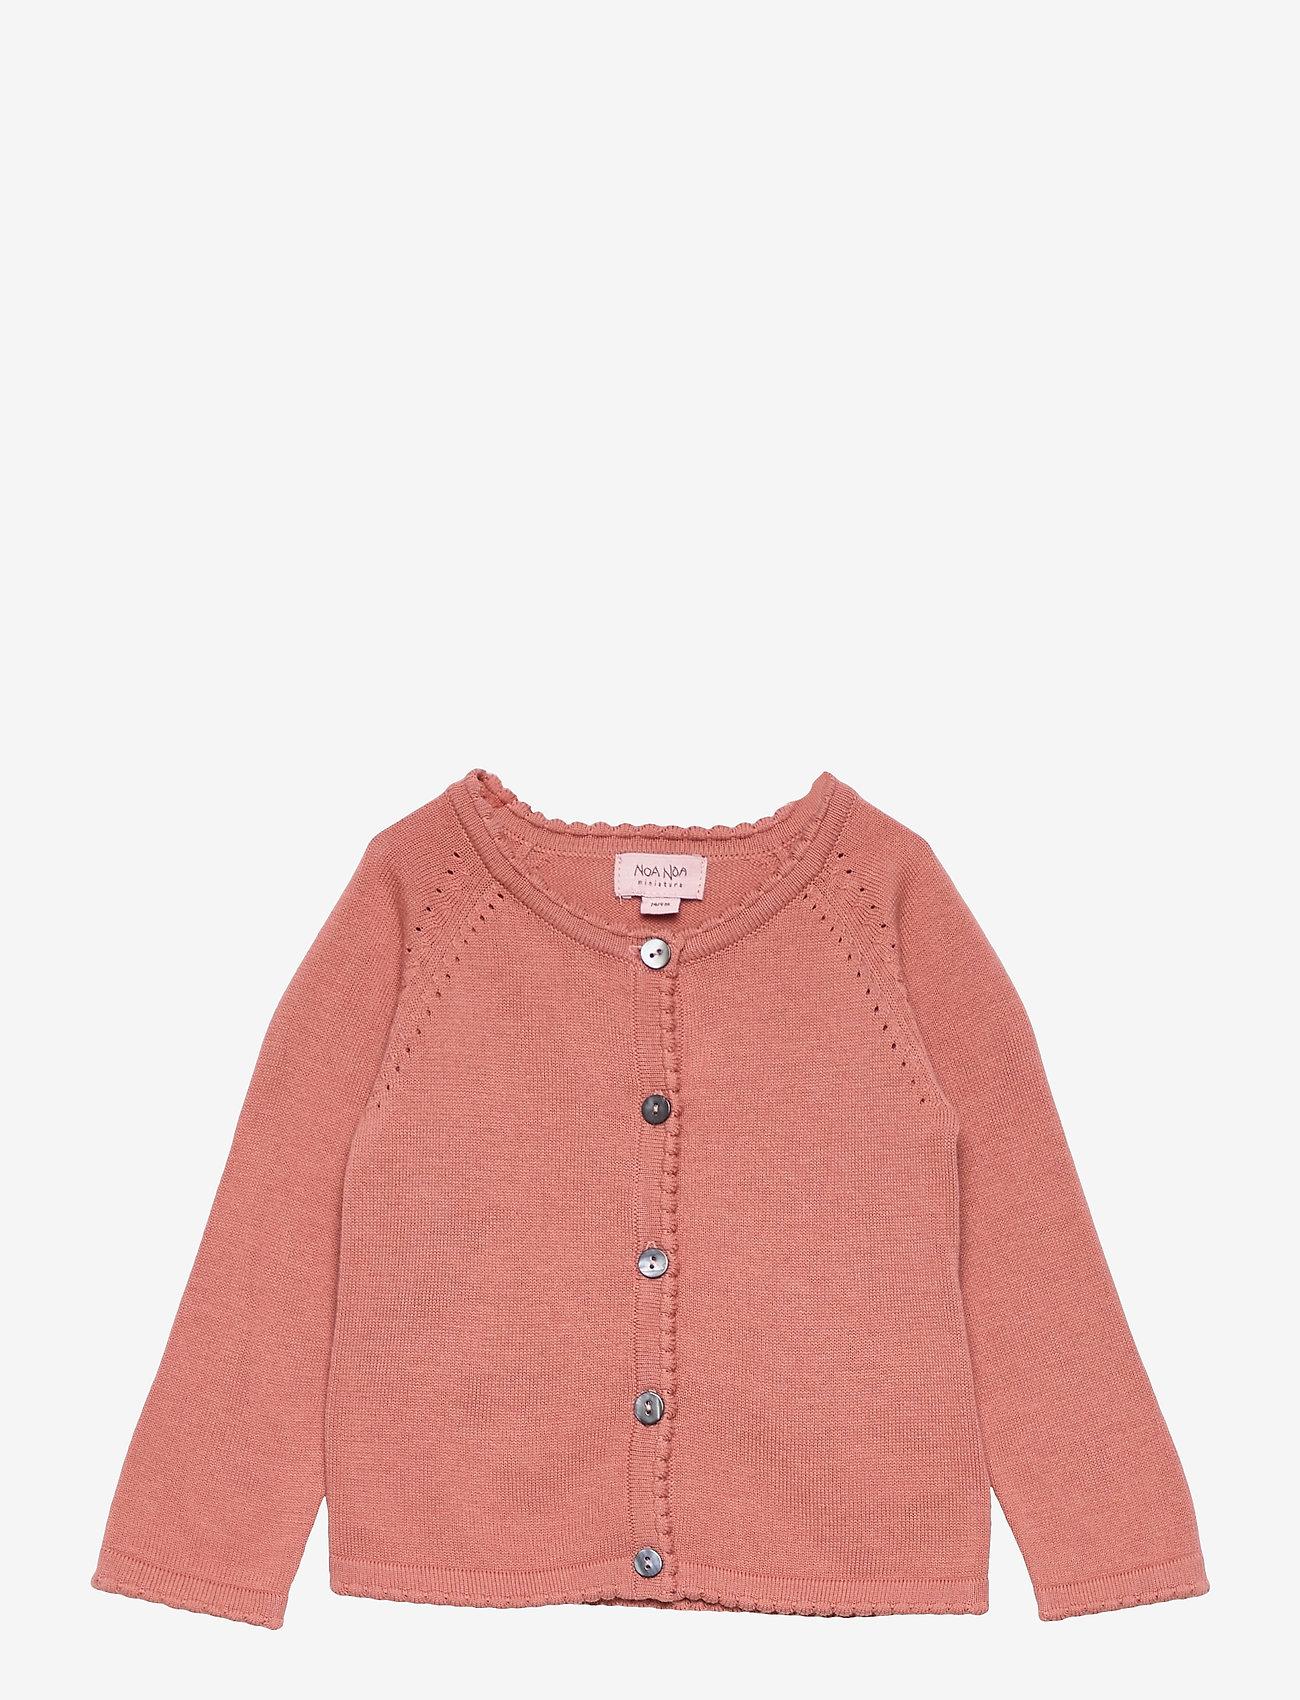 Noa Noa Miniature - Cardigan - gilets - cameo brown - 0